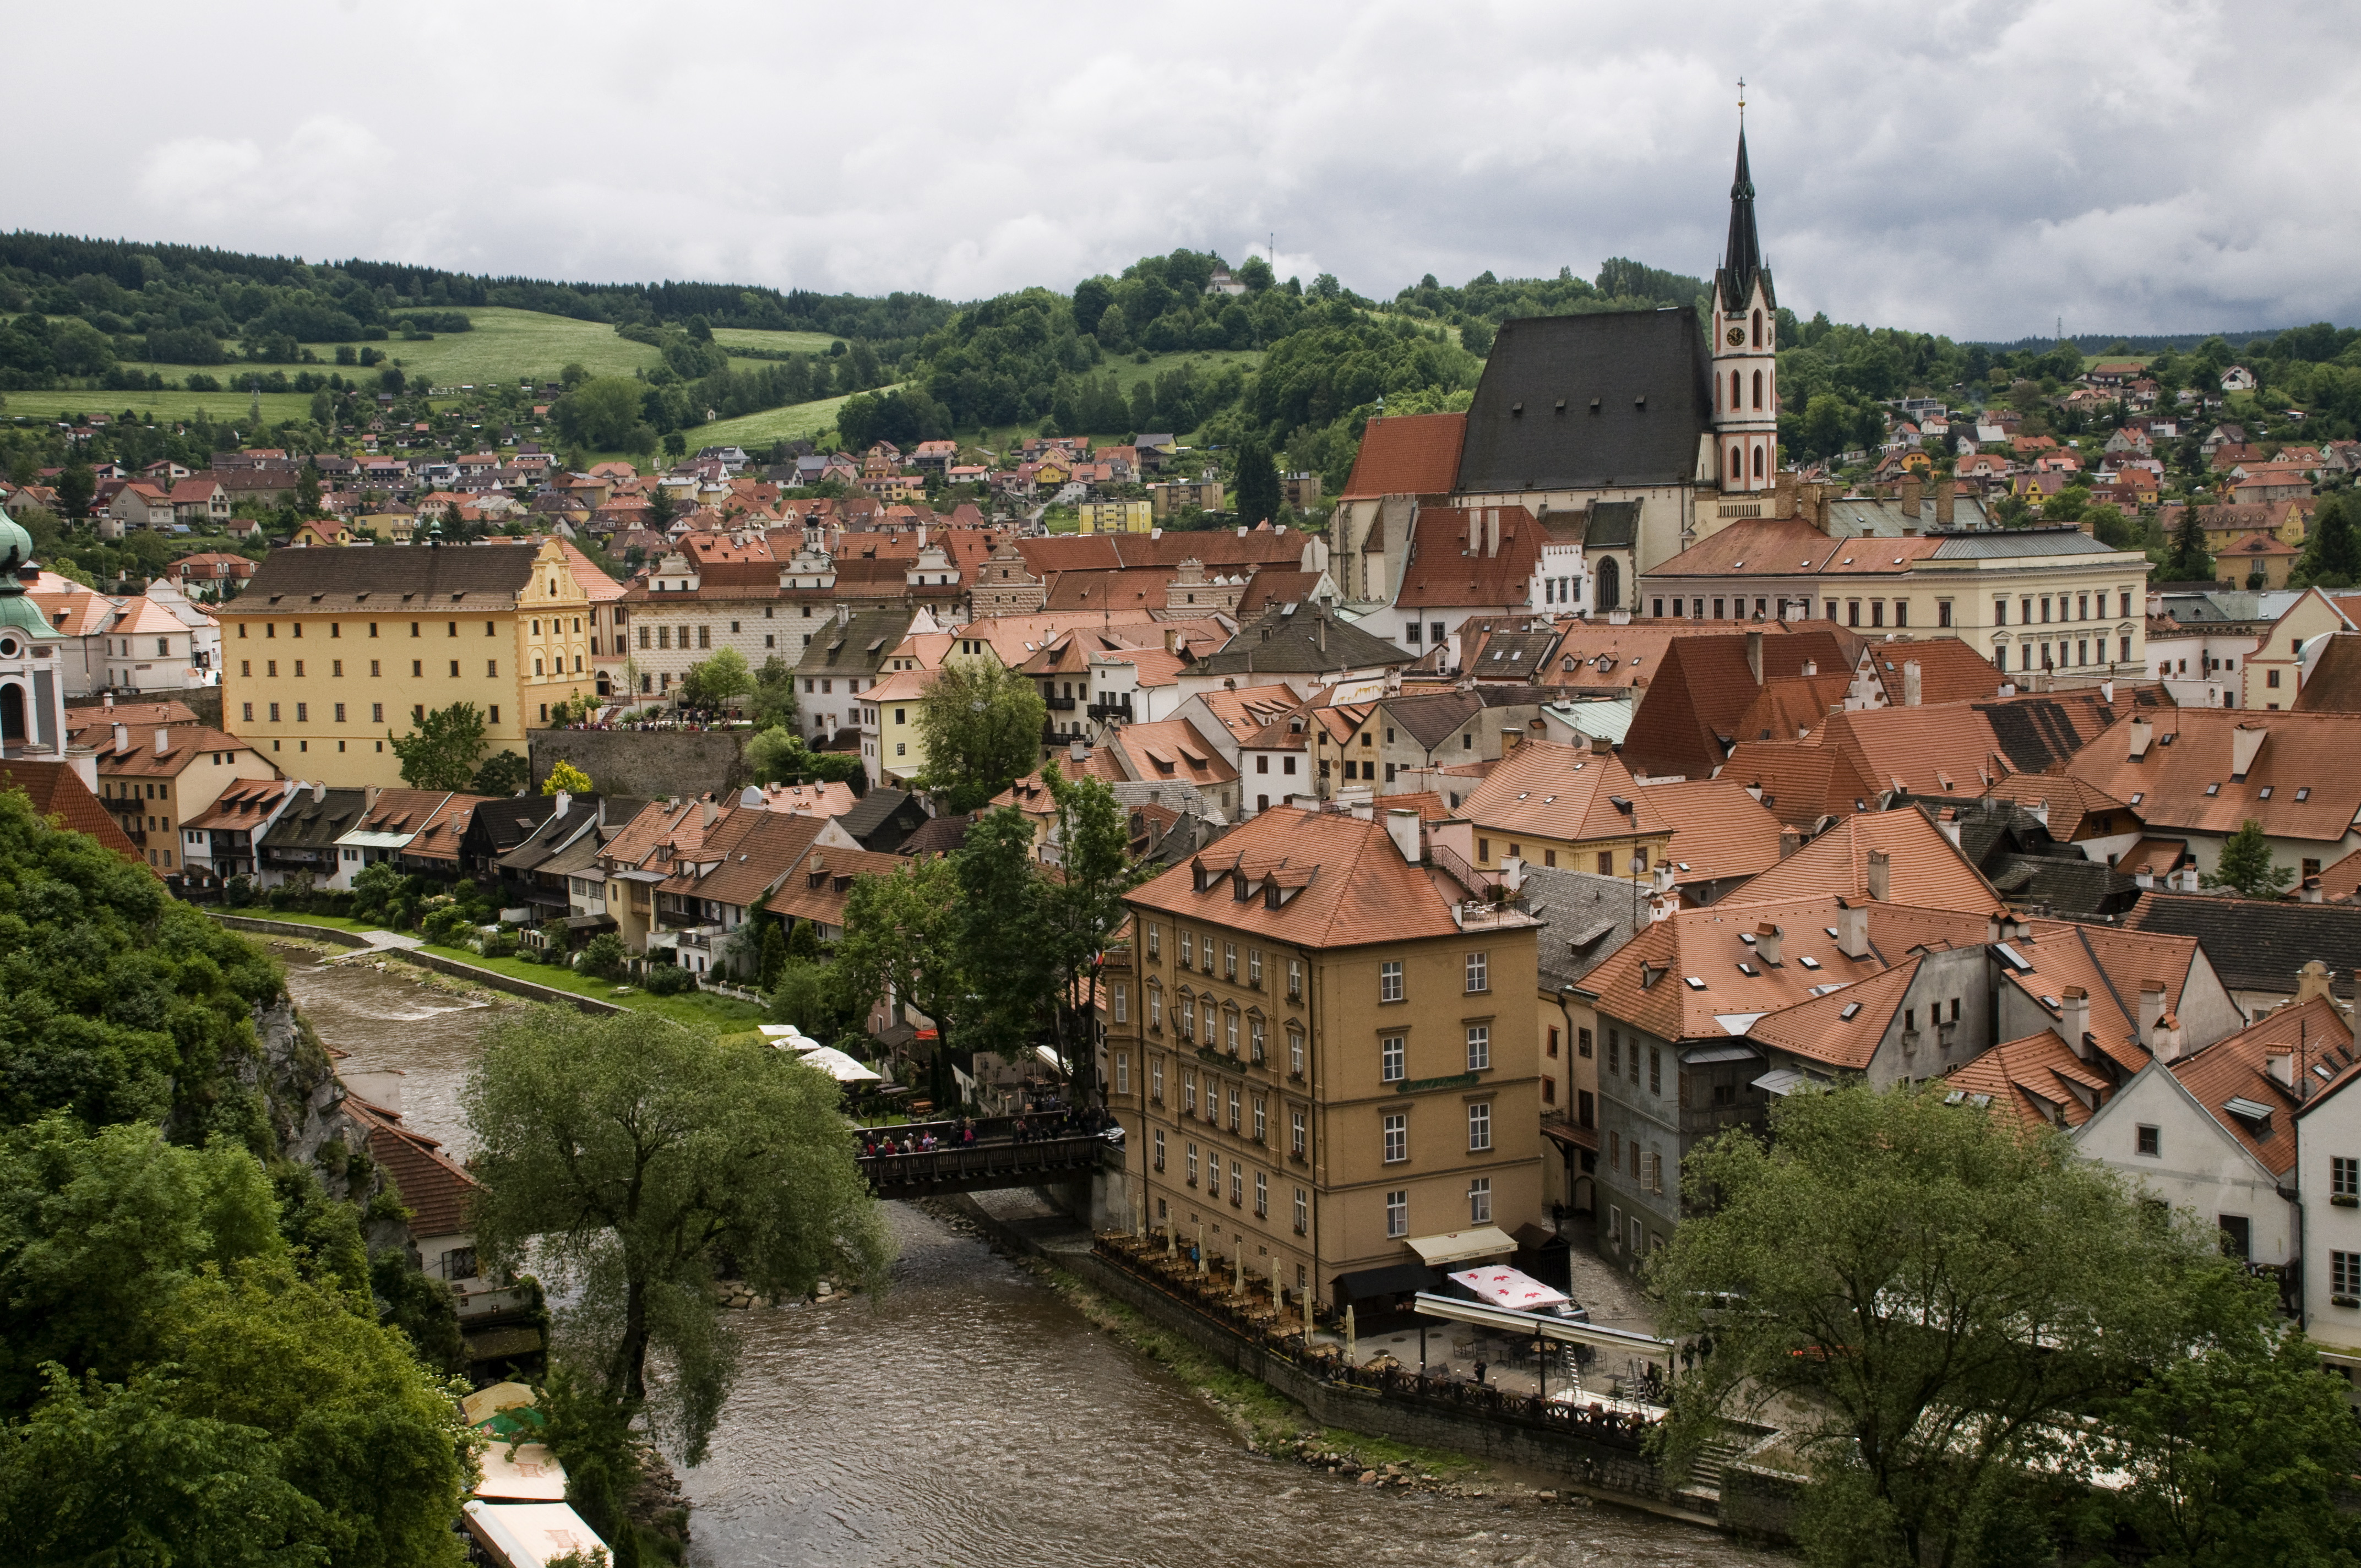 Skyline of Cesky Krumlov, Czech Republic, from the Castle